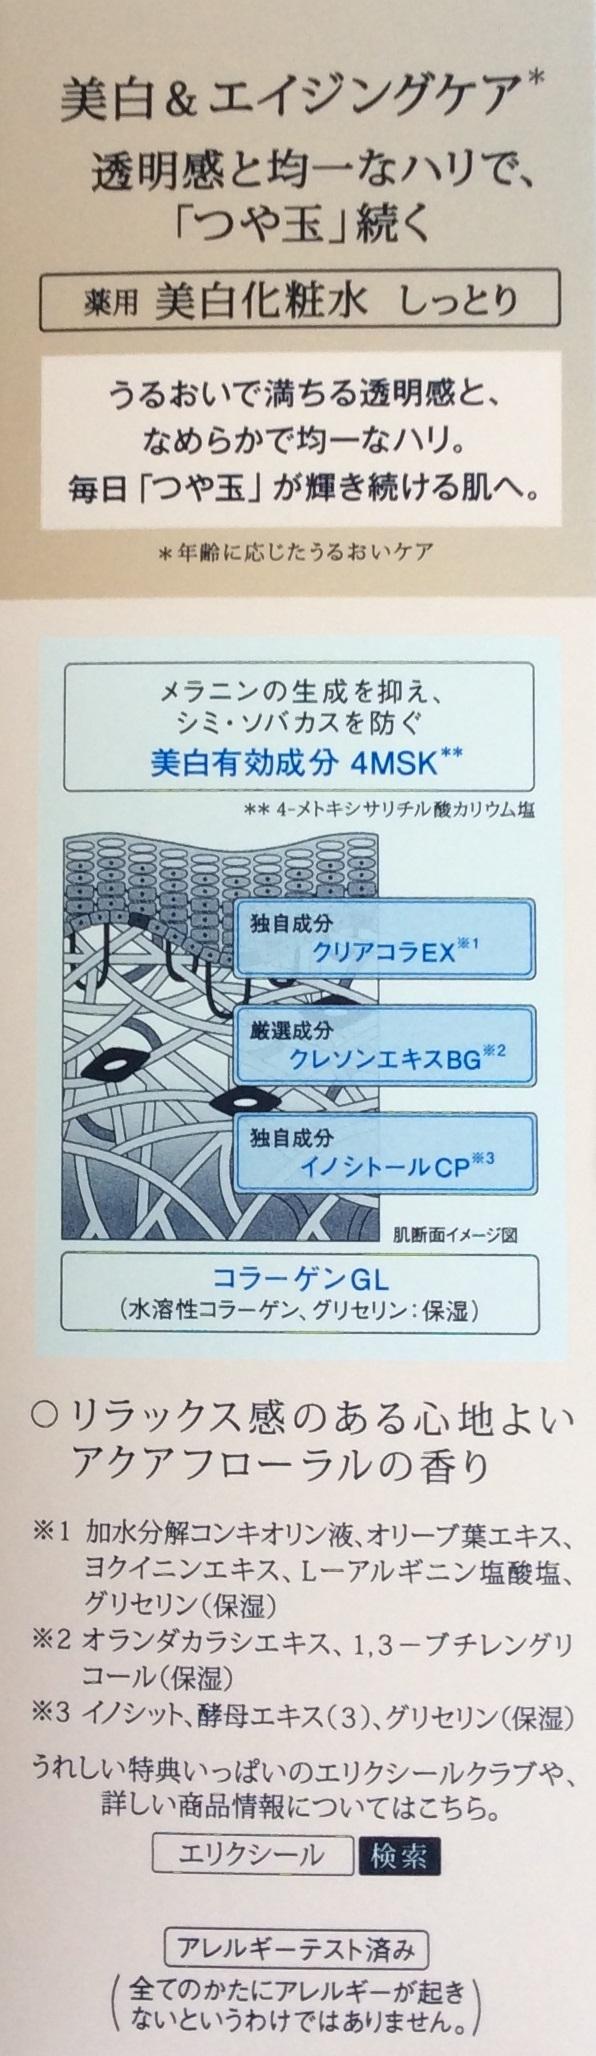 8D810CBE-2F44-4E5B-84BD-321A54C00793.jpeg